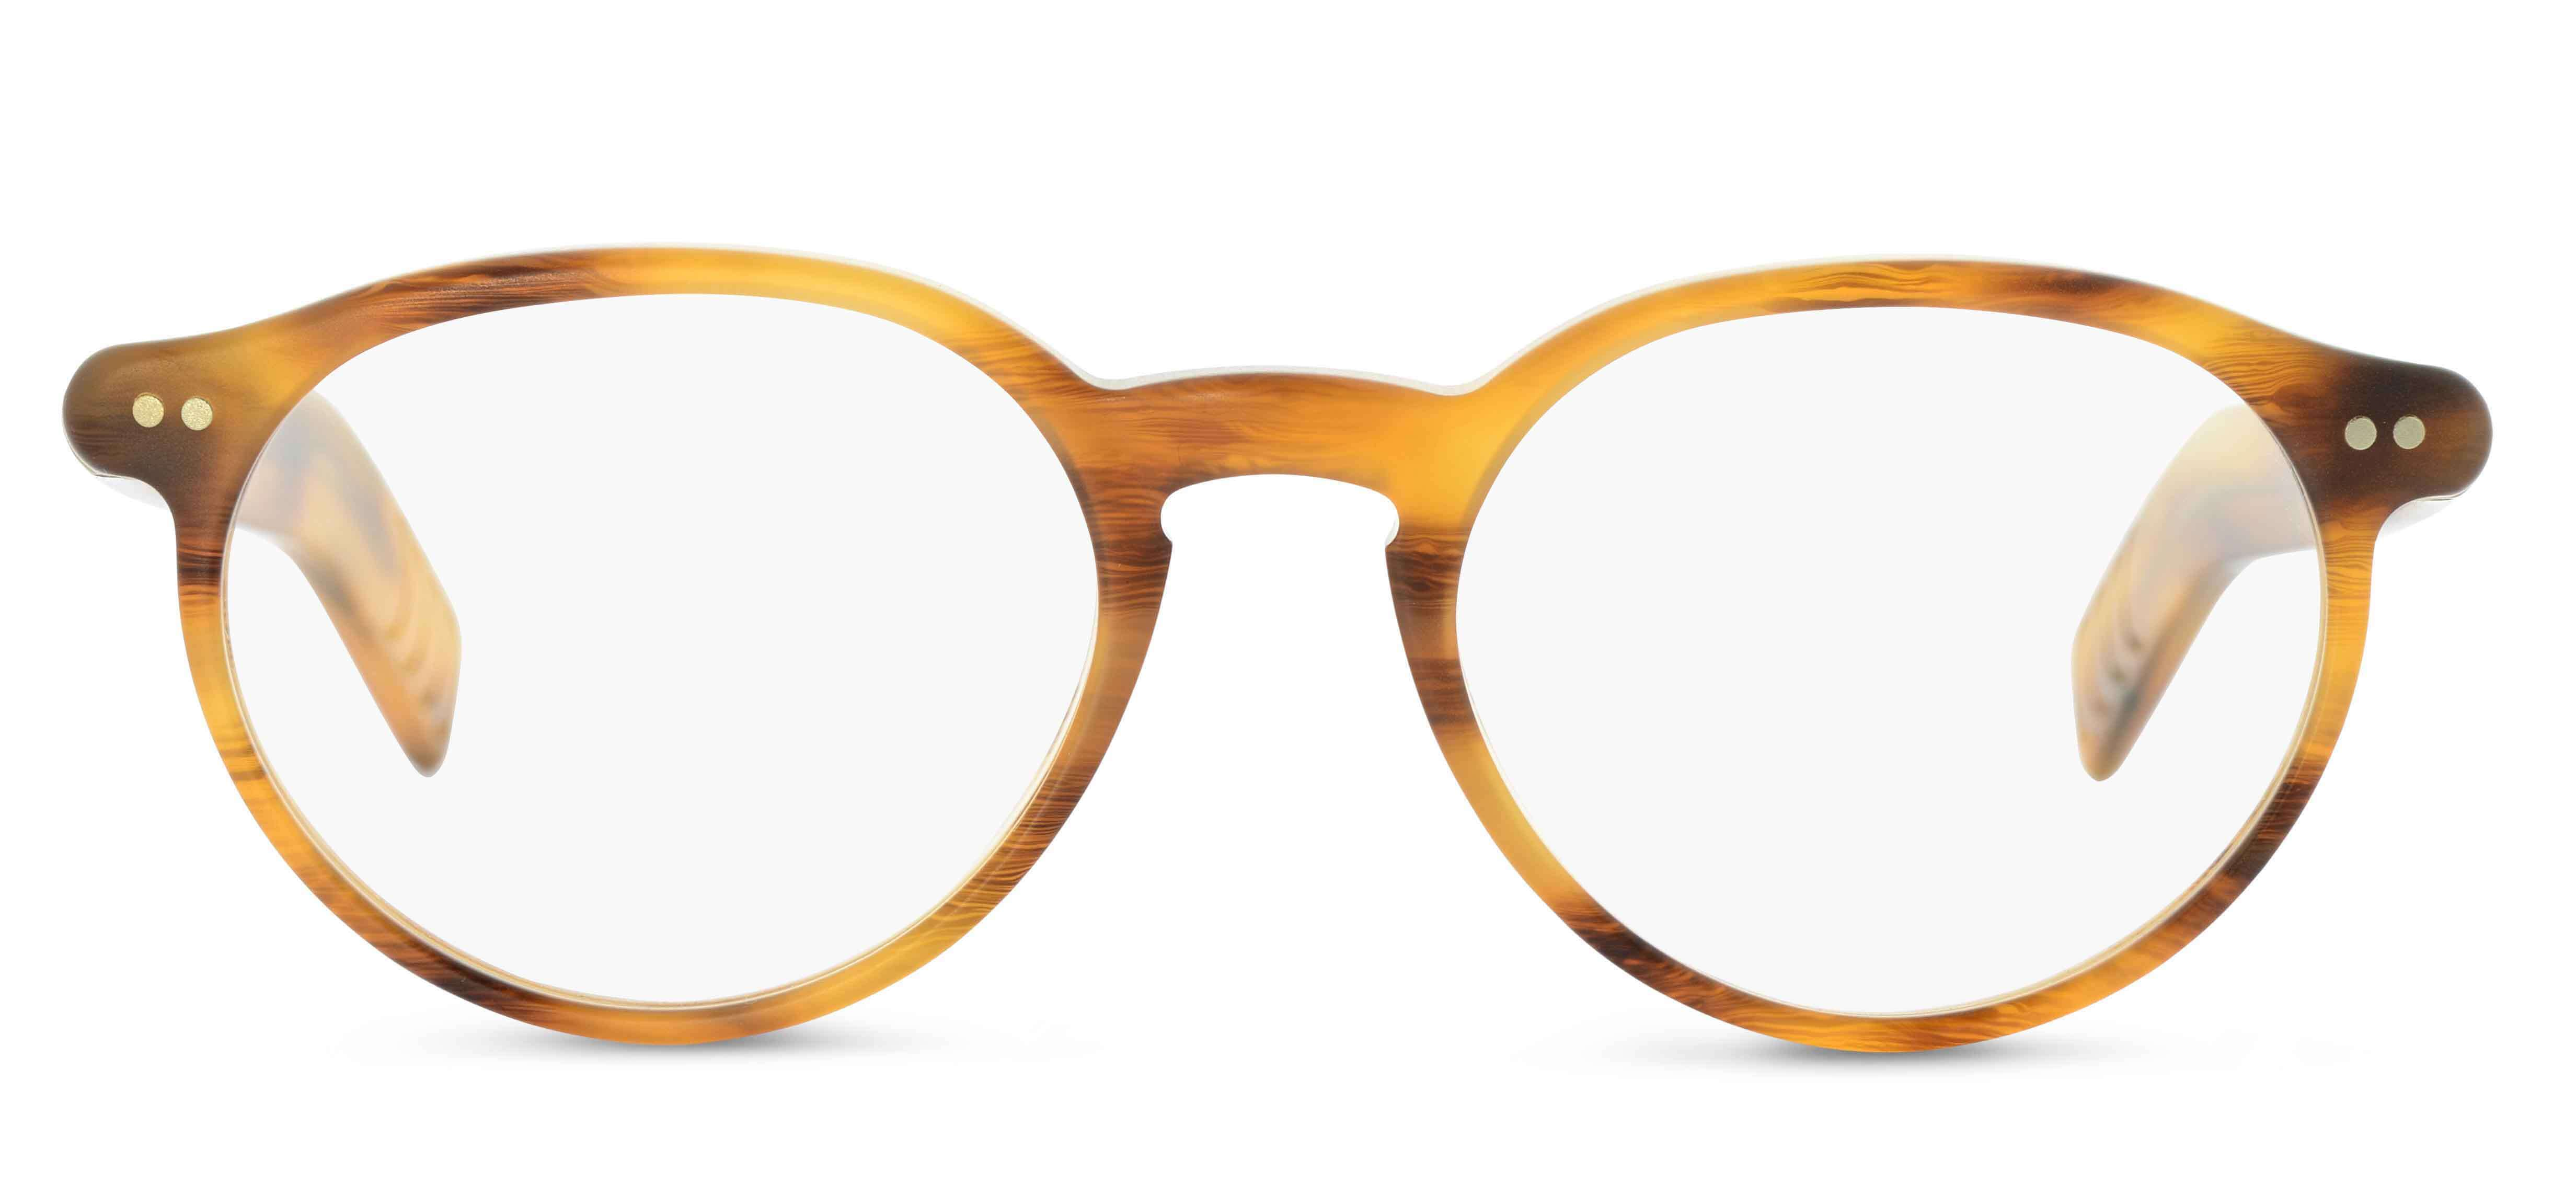 Lunor - Korrekturbrille: Modell: A6_249_03matt_01